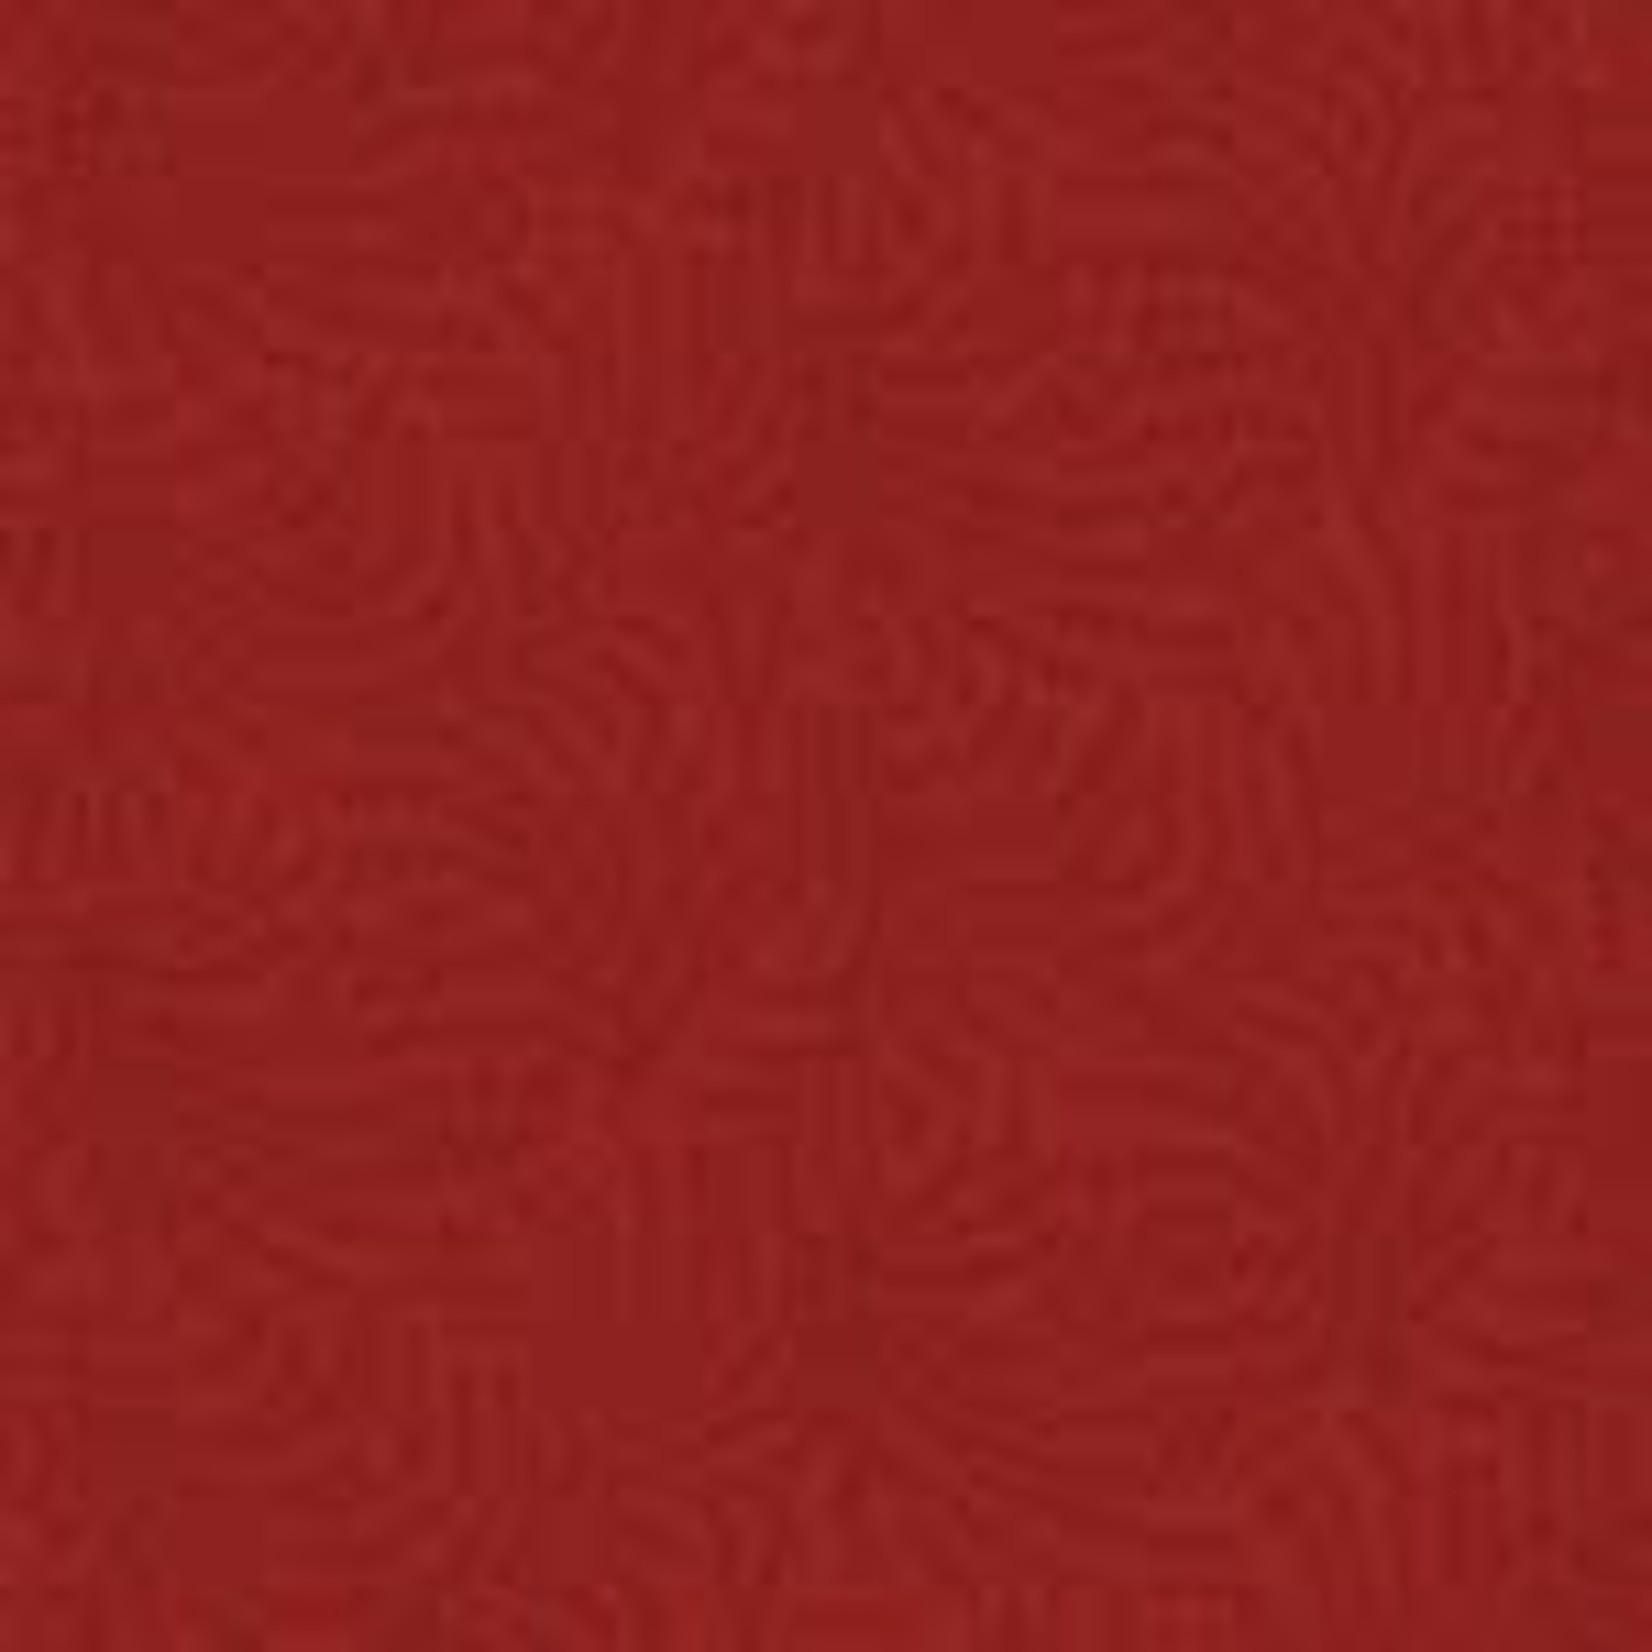 Windham Fabrics Fern - Rood